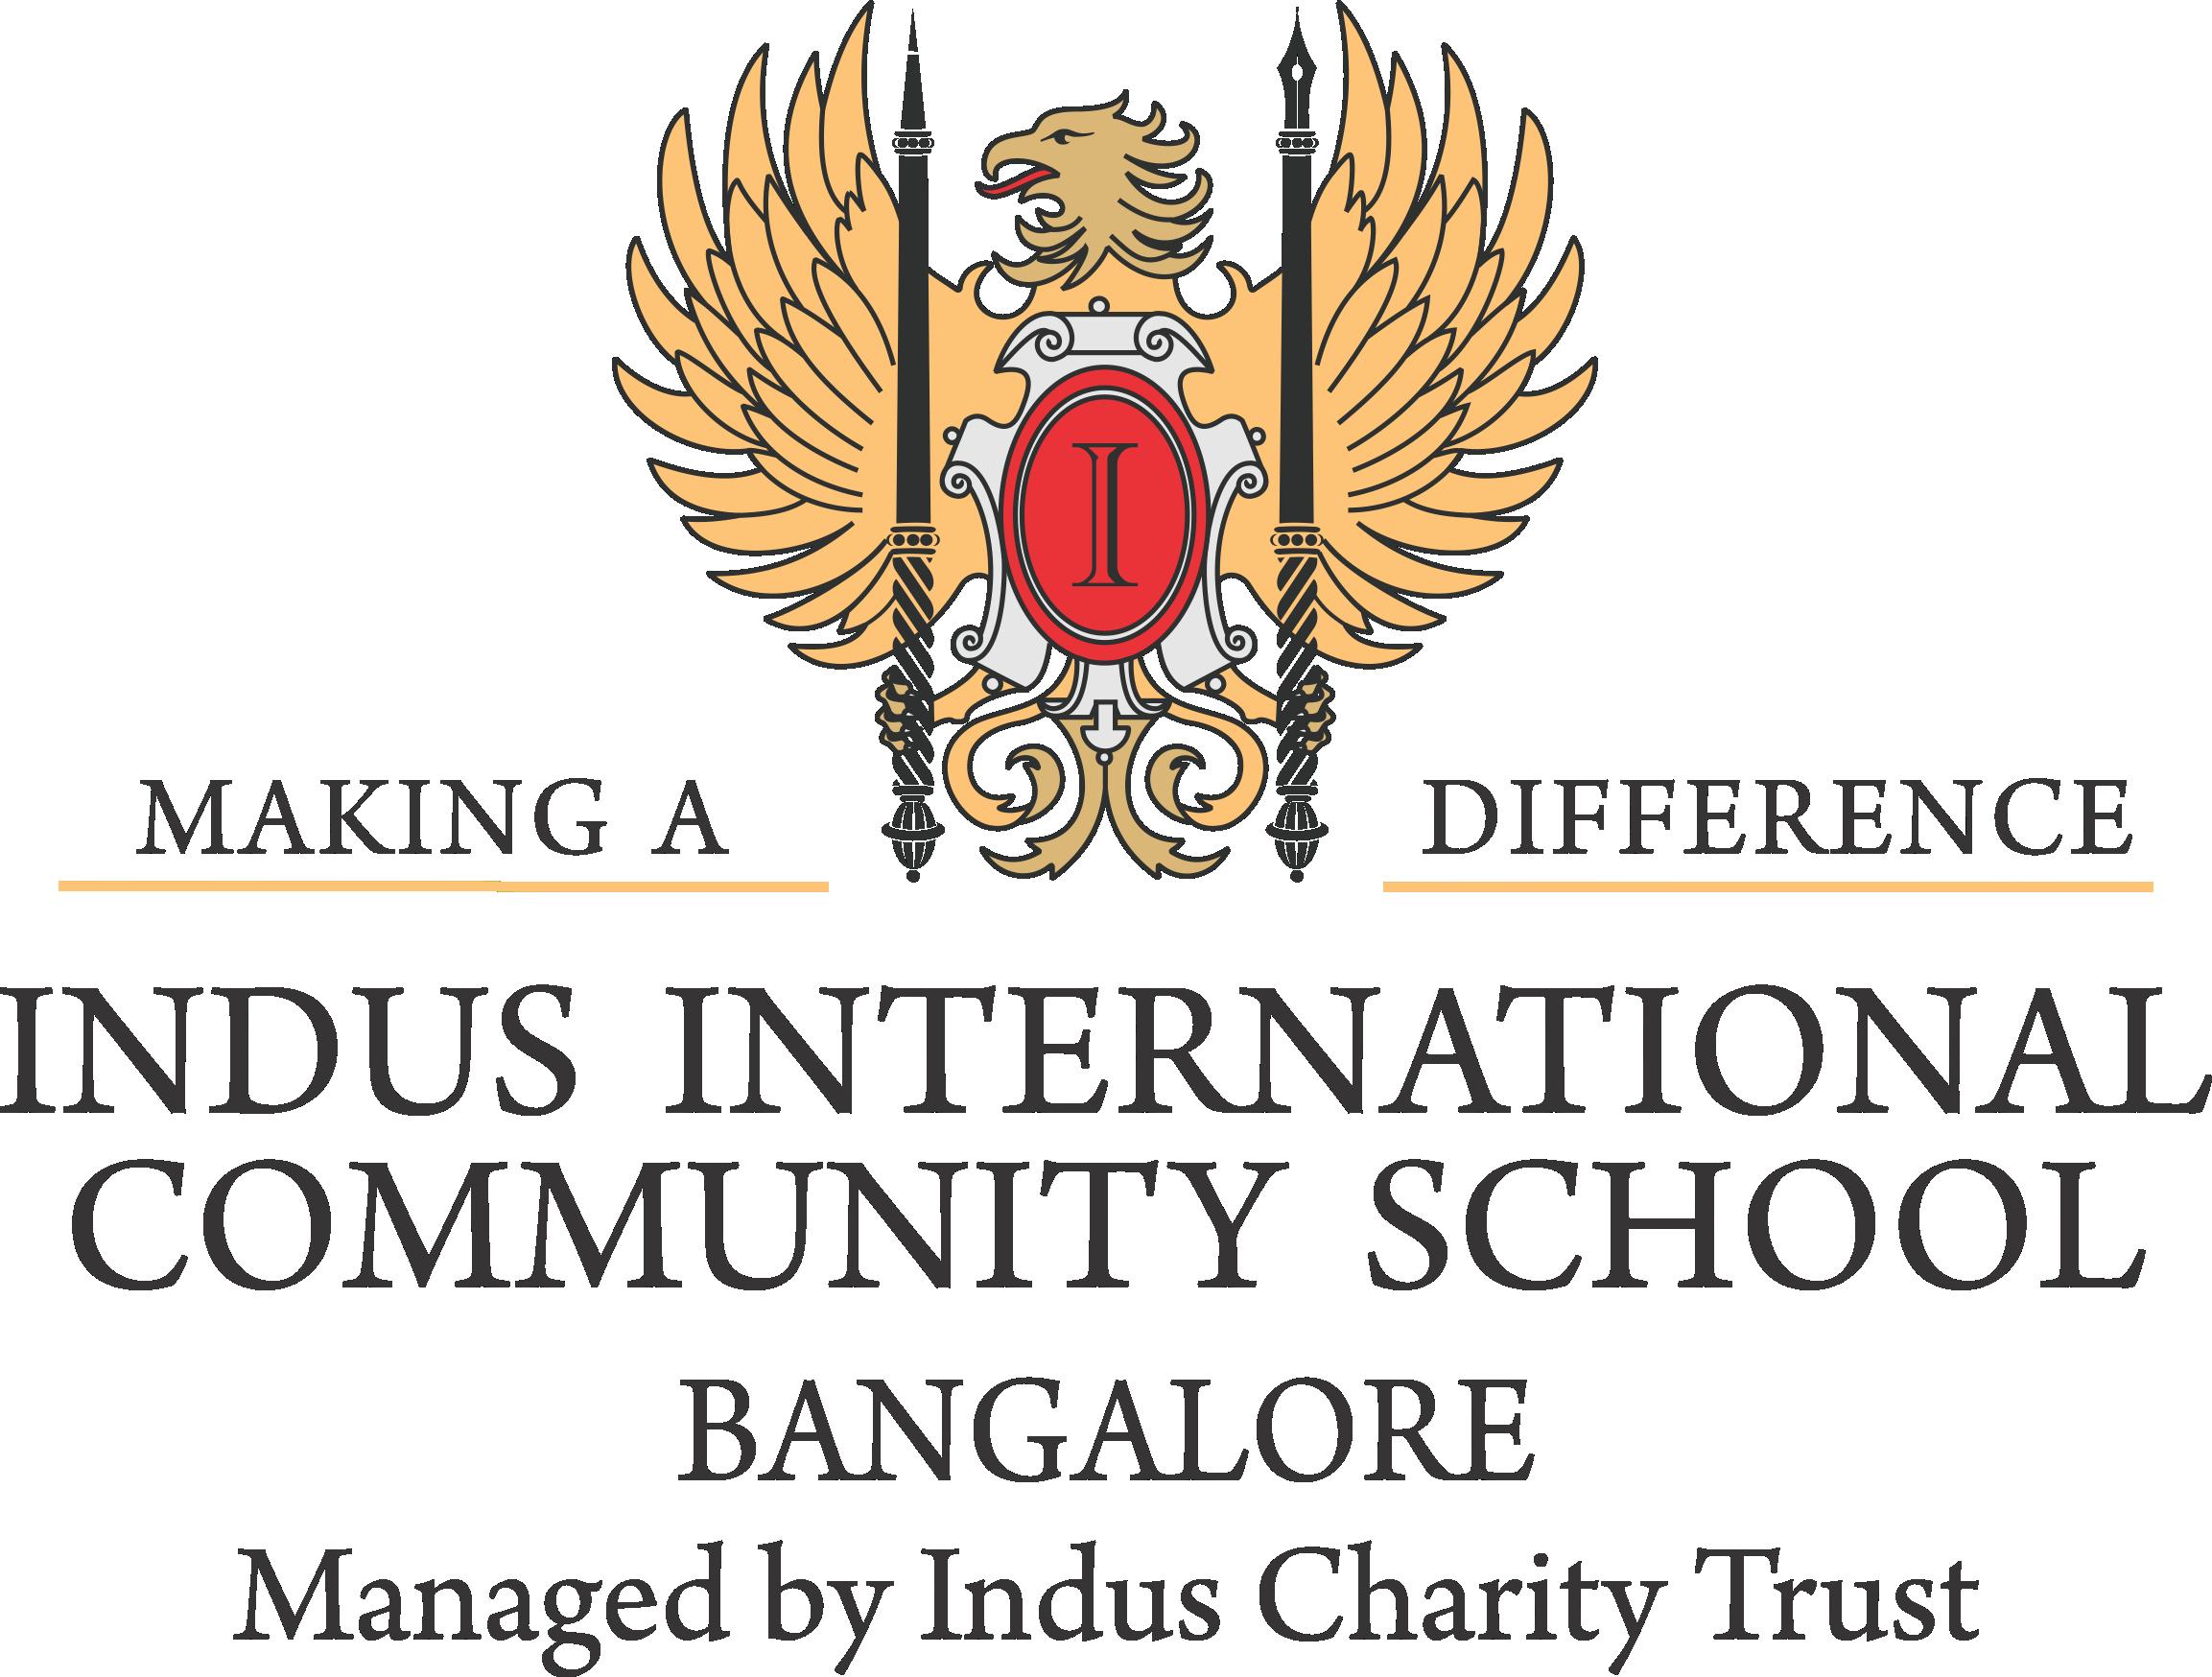 Indus International Community School - Bangalore Image